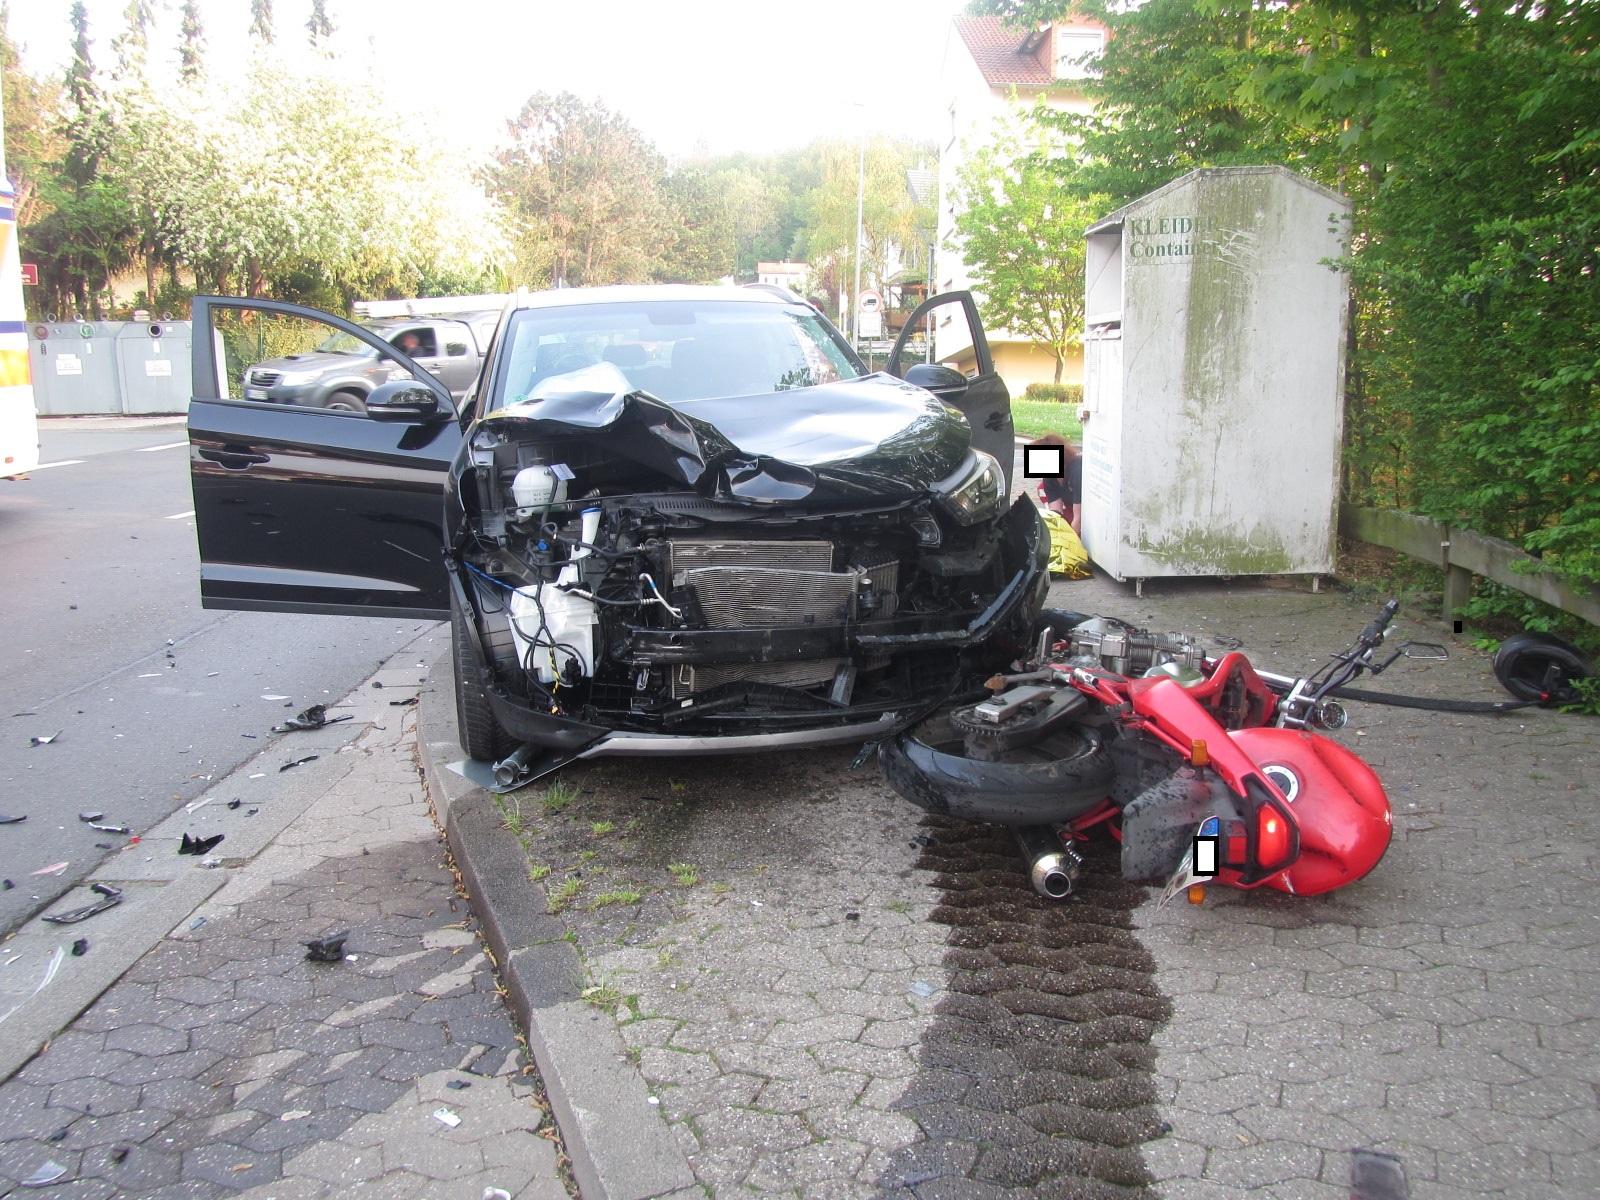 pol pdkh verkehrsunfall mit einem schwerverletzten motorradfahrer presseportal. Black Bedroom Furniture Sets. Home Design Ideas